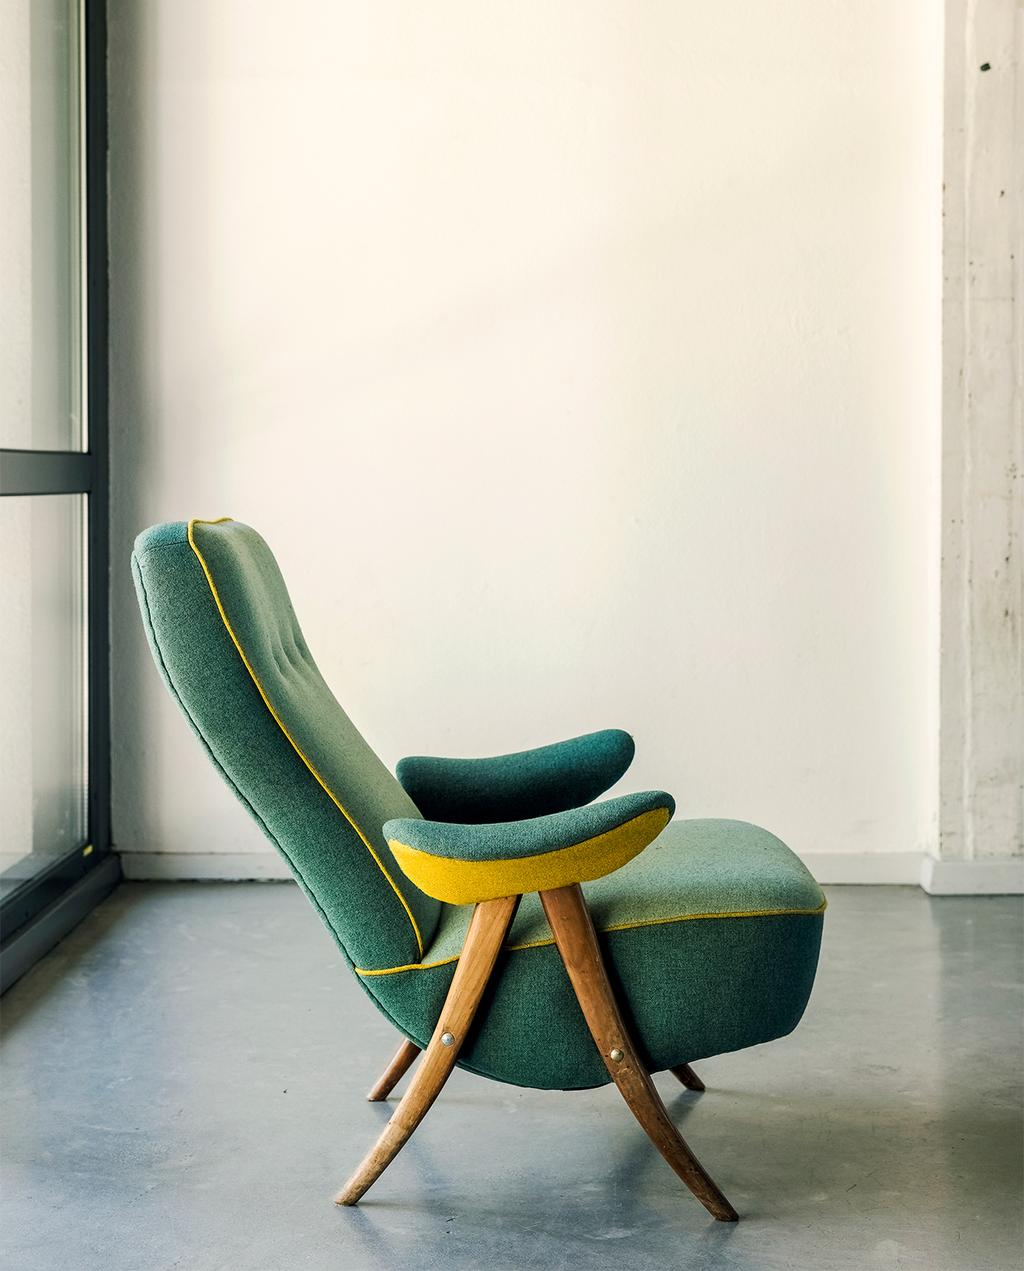 vtwonen 08-2021 | een groene fauteuil